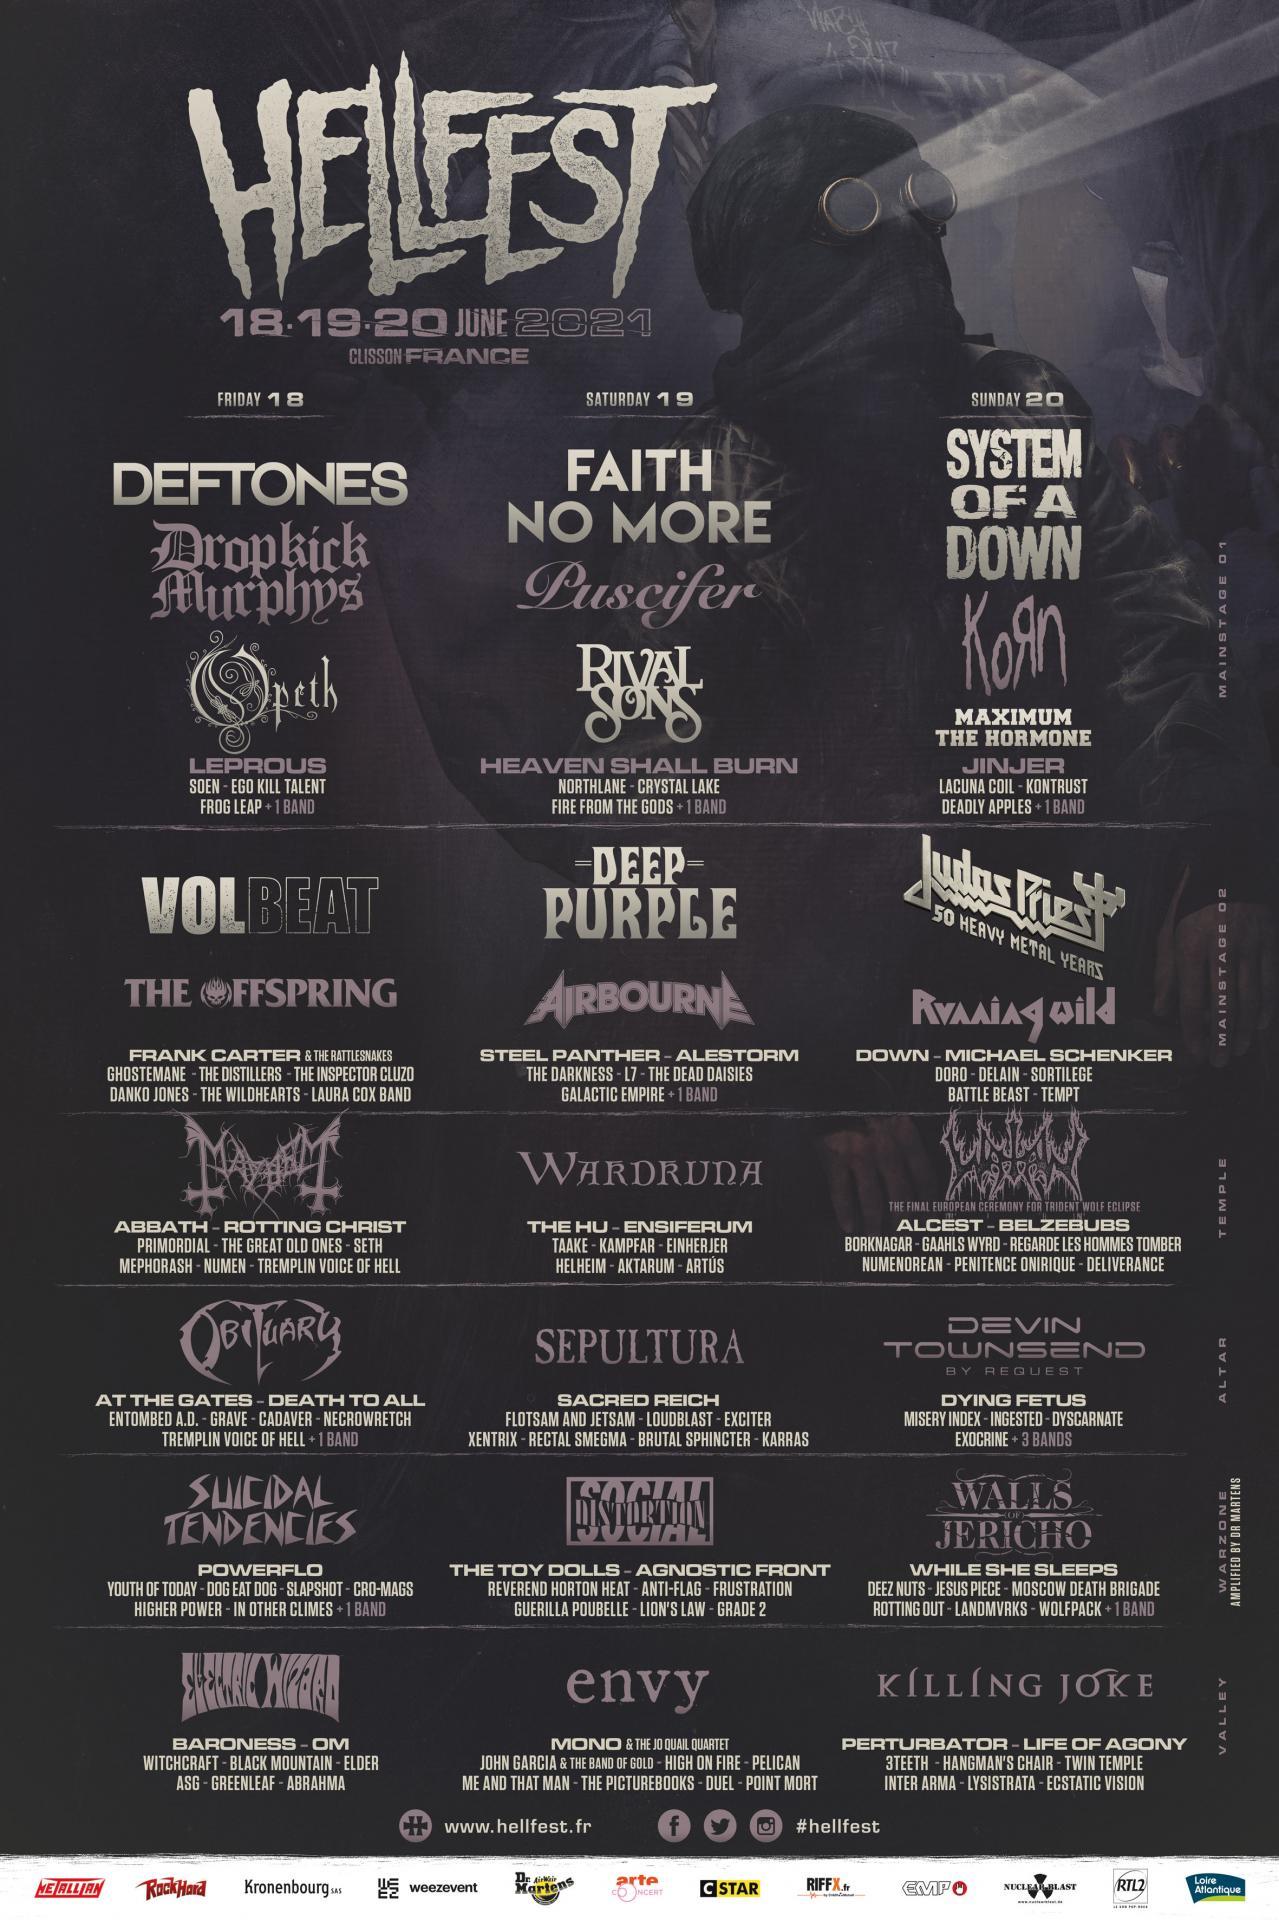 Hellfest 2021 line up